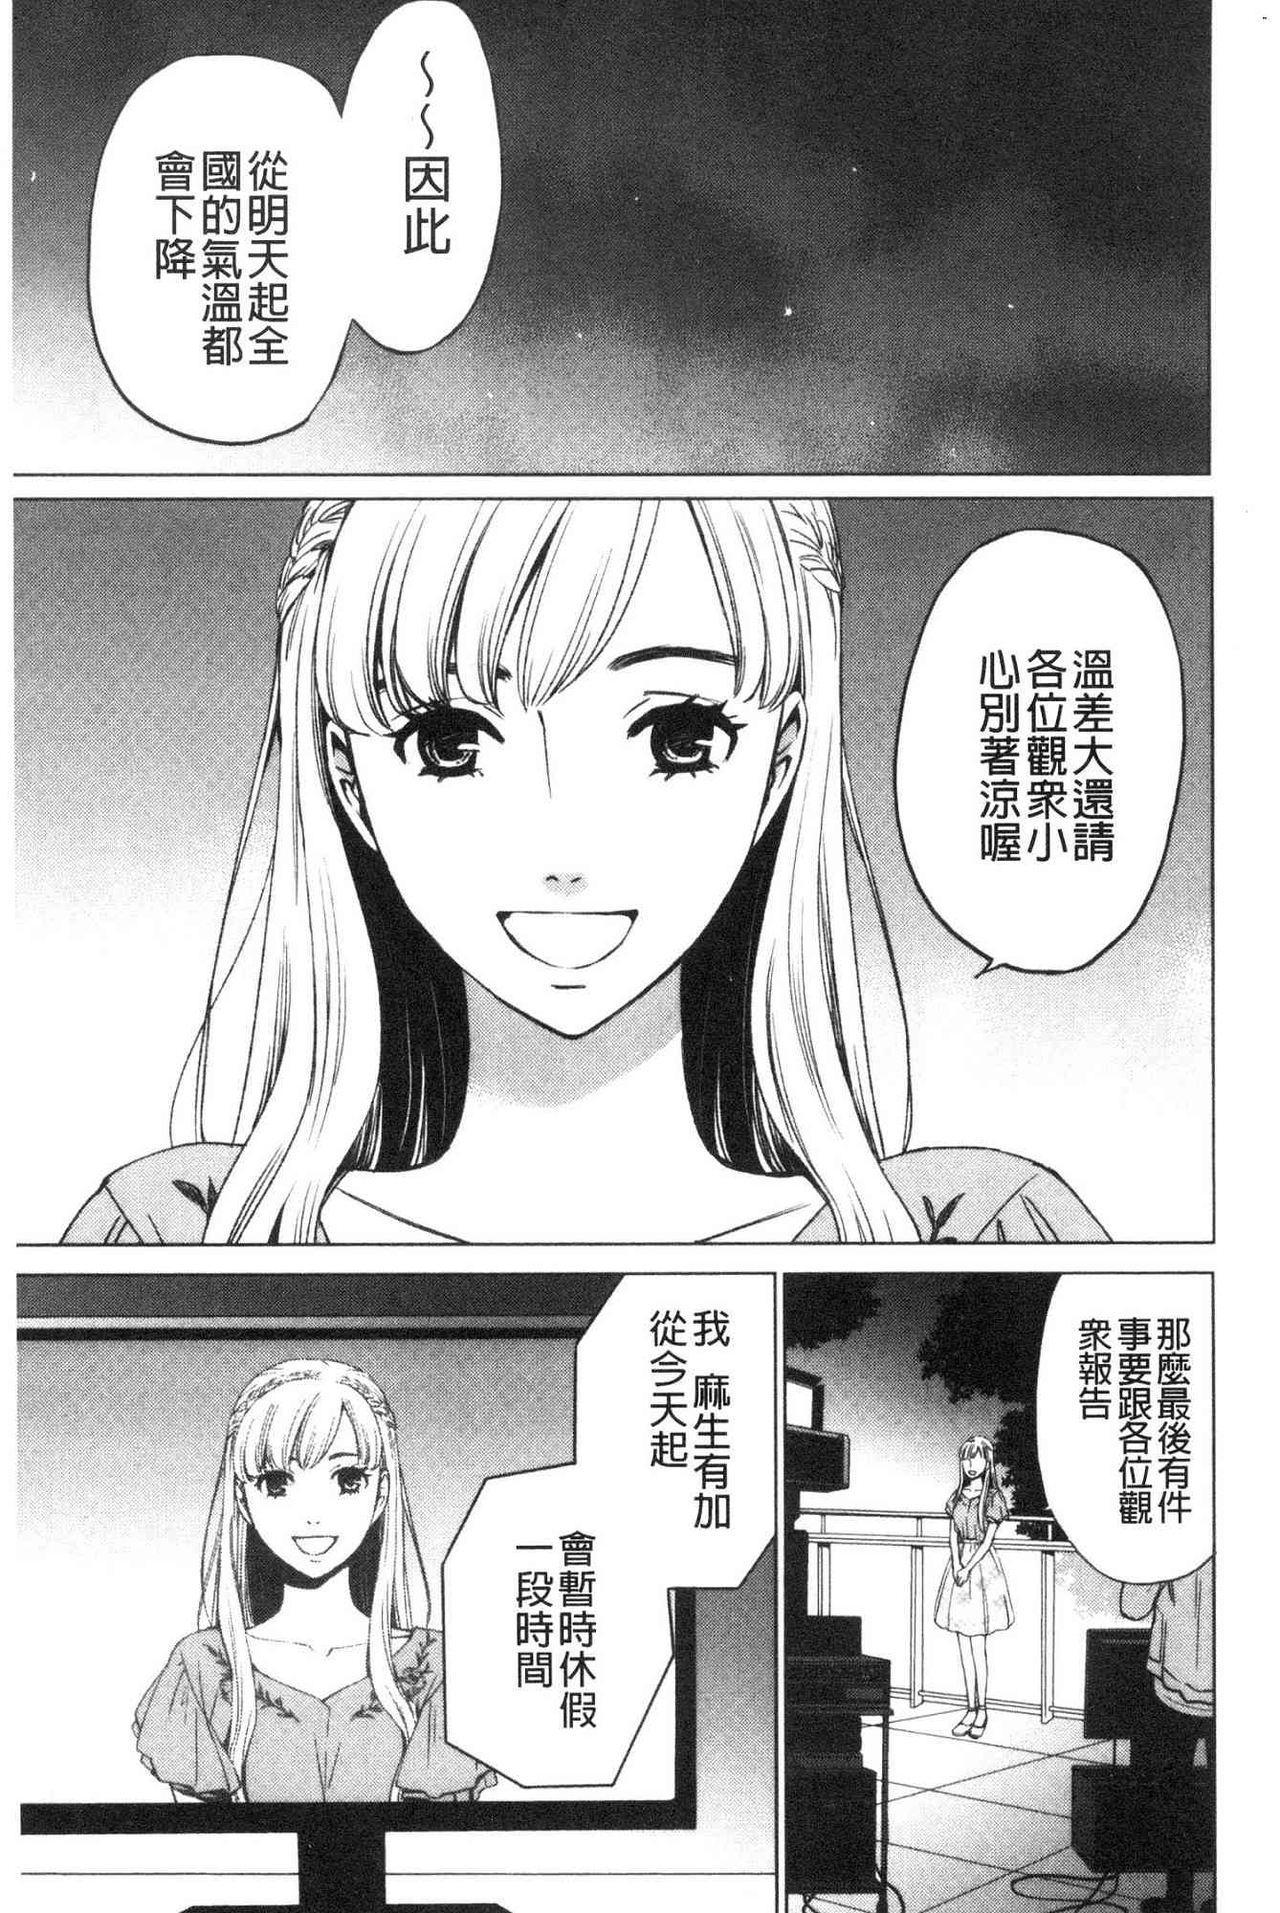 [Gotoh Akira]  21-ji no Onna ~Camera no Mae no Mesuinu~ 2 | 21時之女 ~鏡頭前的牝犬~ 2 [Chinese] 150